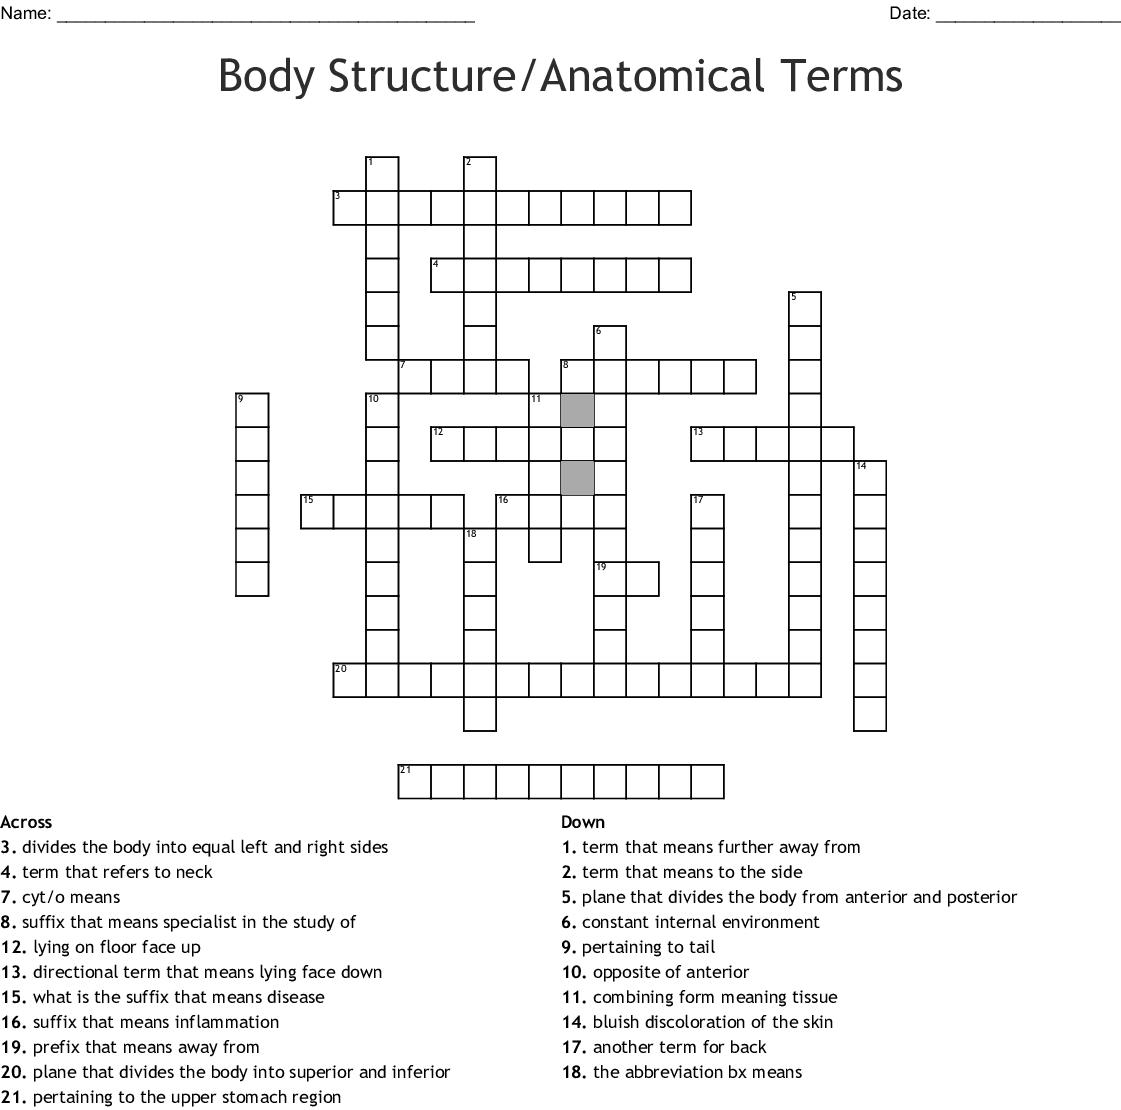 Body Structureanatomical Terms Crossword Wordmint